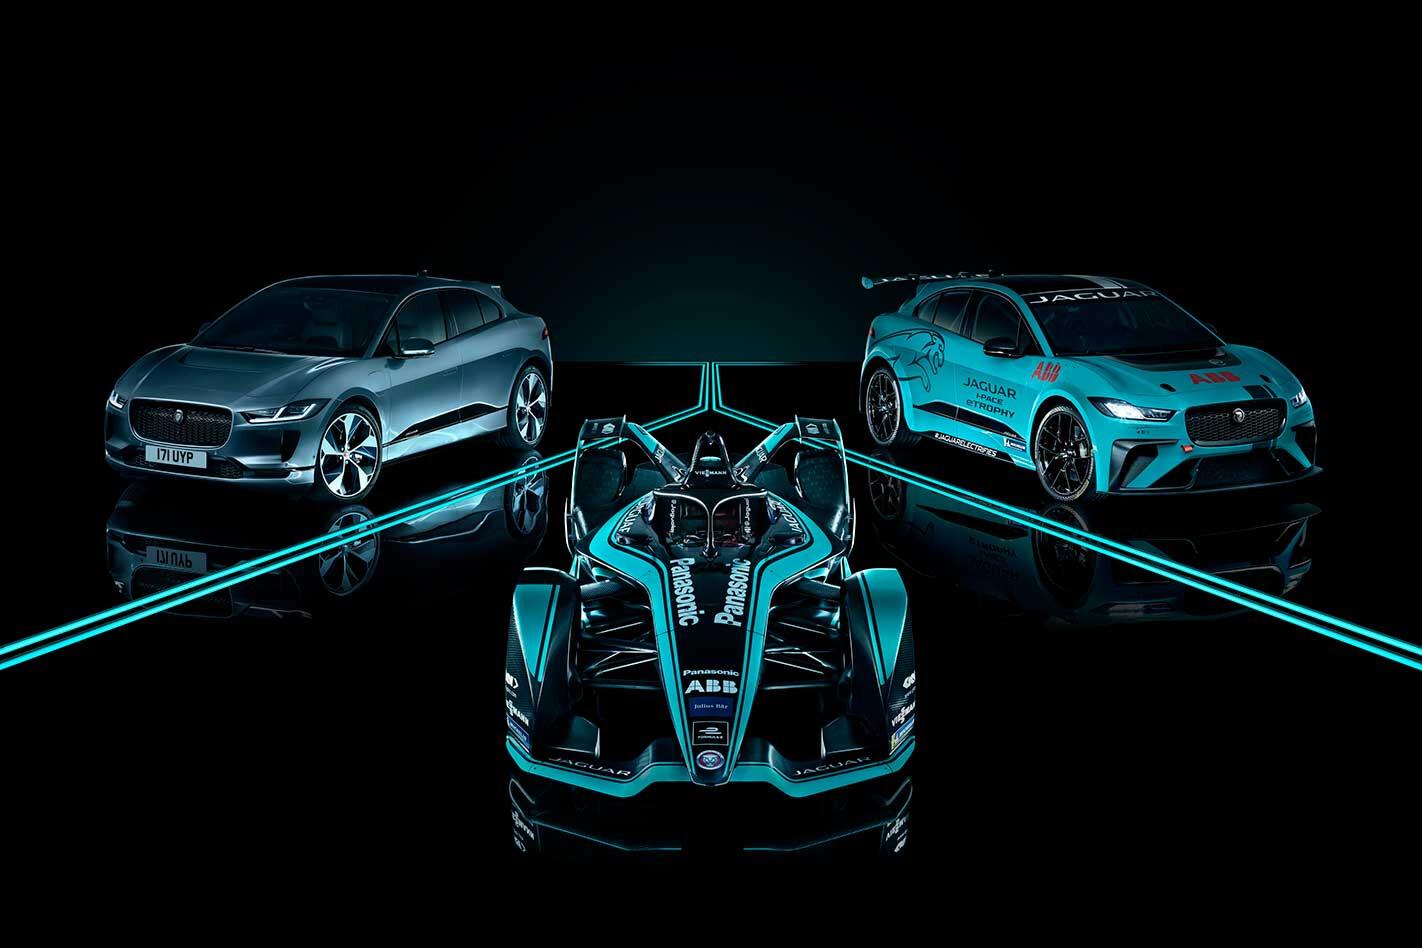 Jaguar I-Pace reaps improvements thanks to motorsport